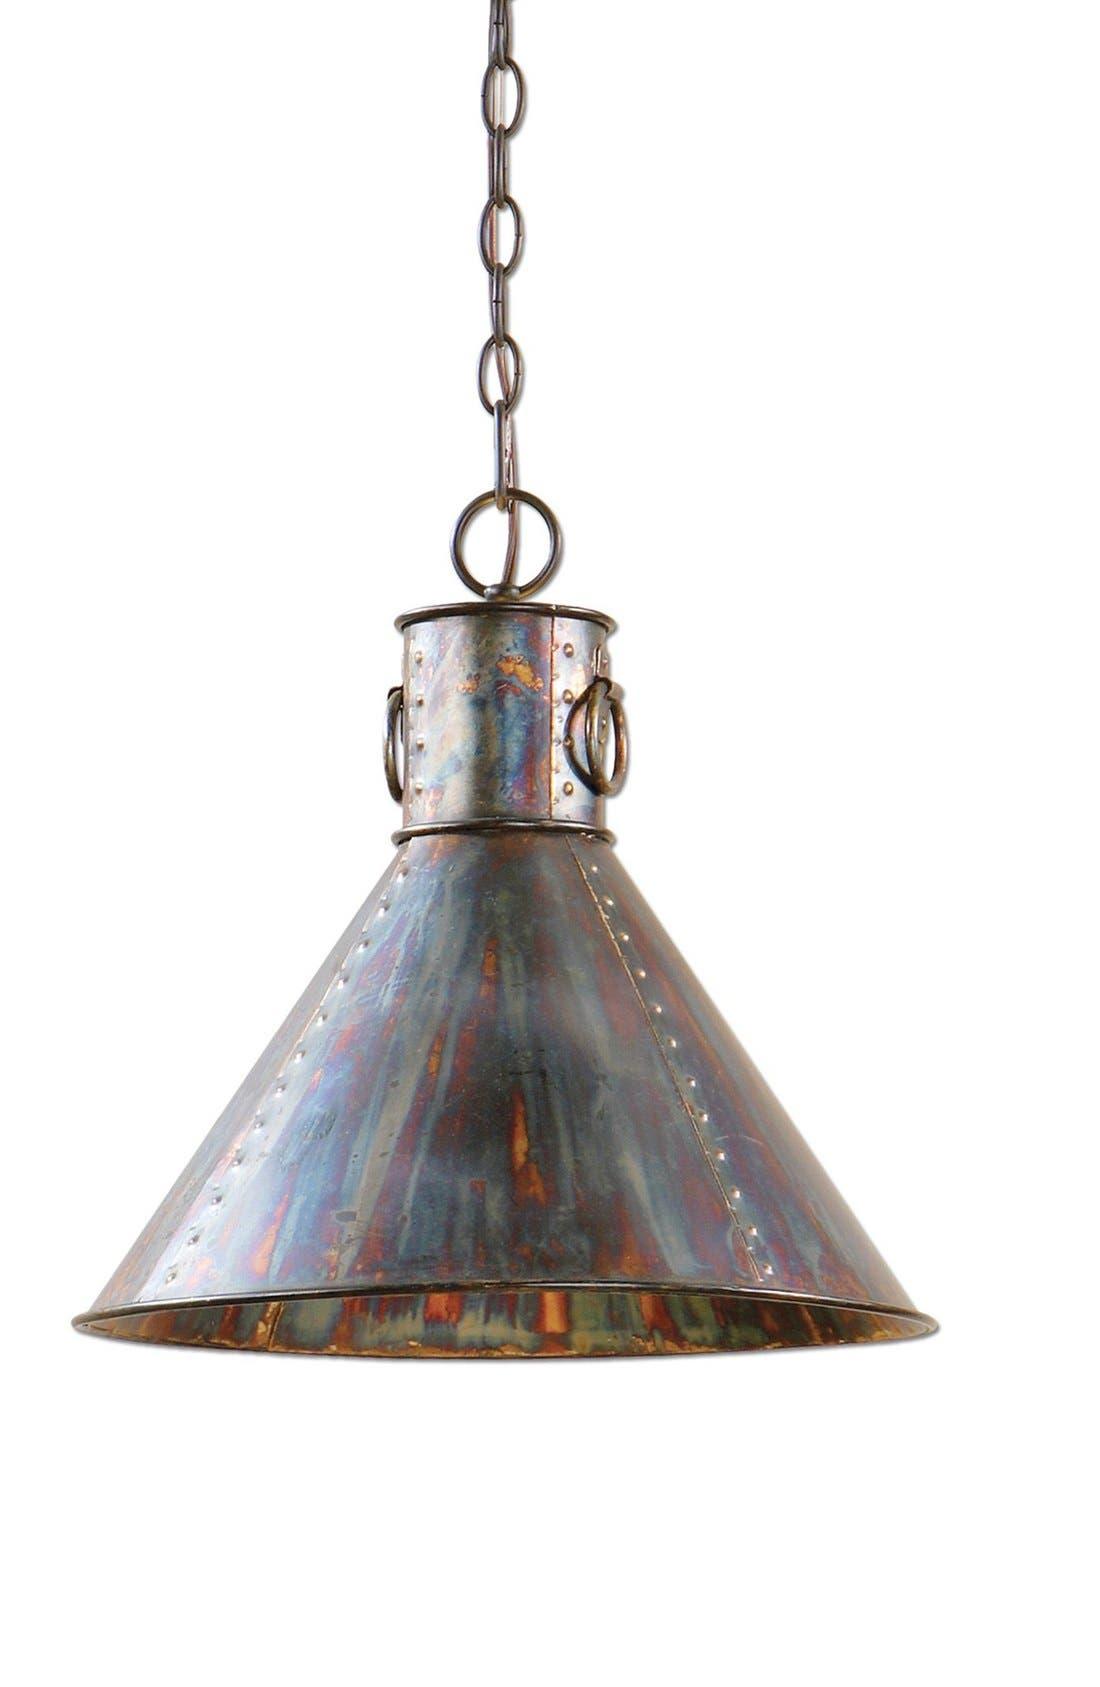 Main Image - Uttermost 'Albiano Series - Levone' Oxidized Bronze Pendant Lamp